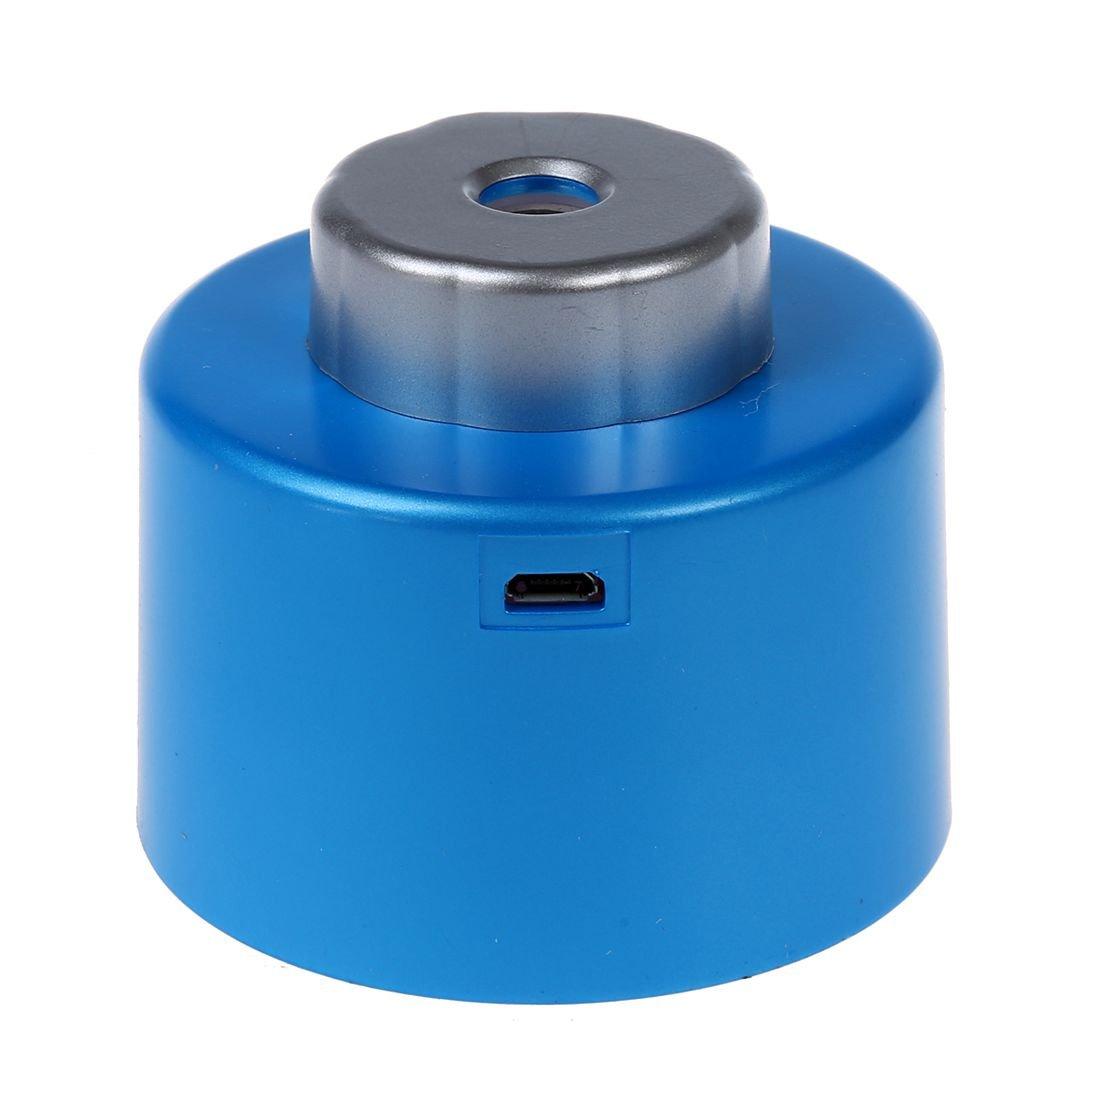 Mini Portatil Botella Casquillo Humidificador de Aire con el Cable USB para el Ministerio del Interior R TOOGOO Color Azul